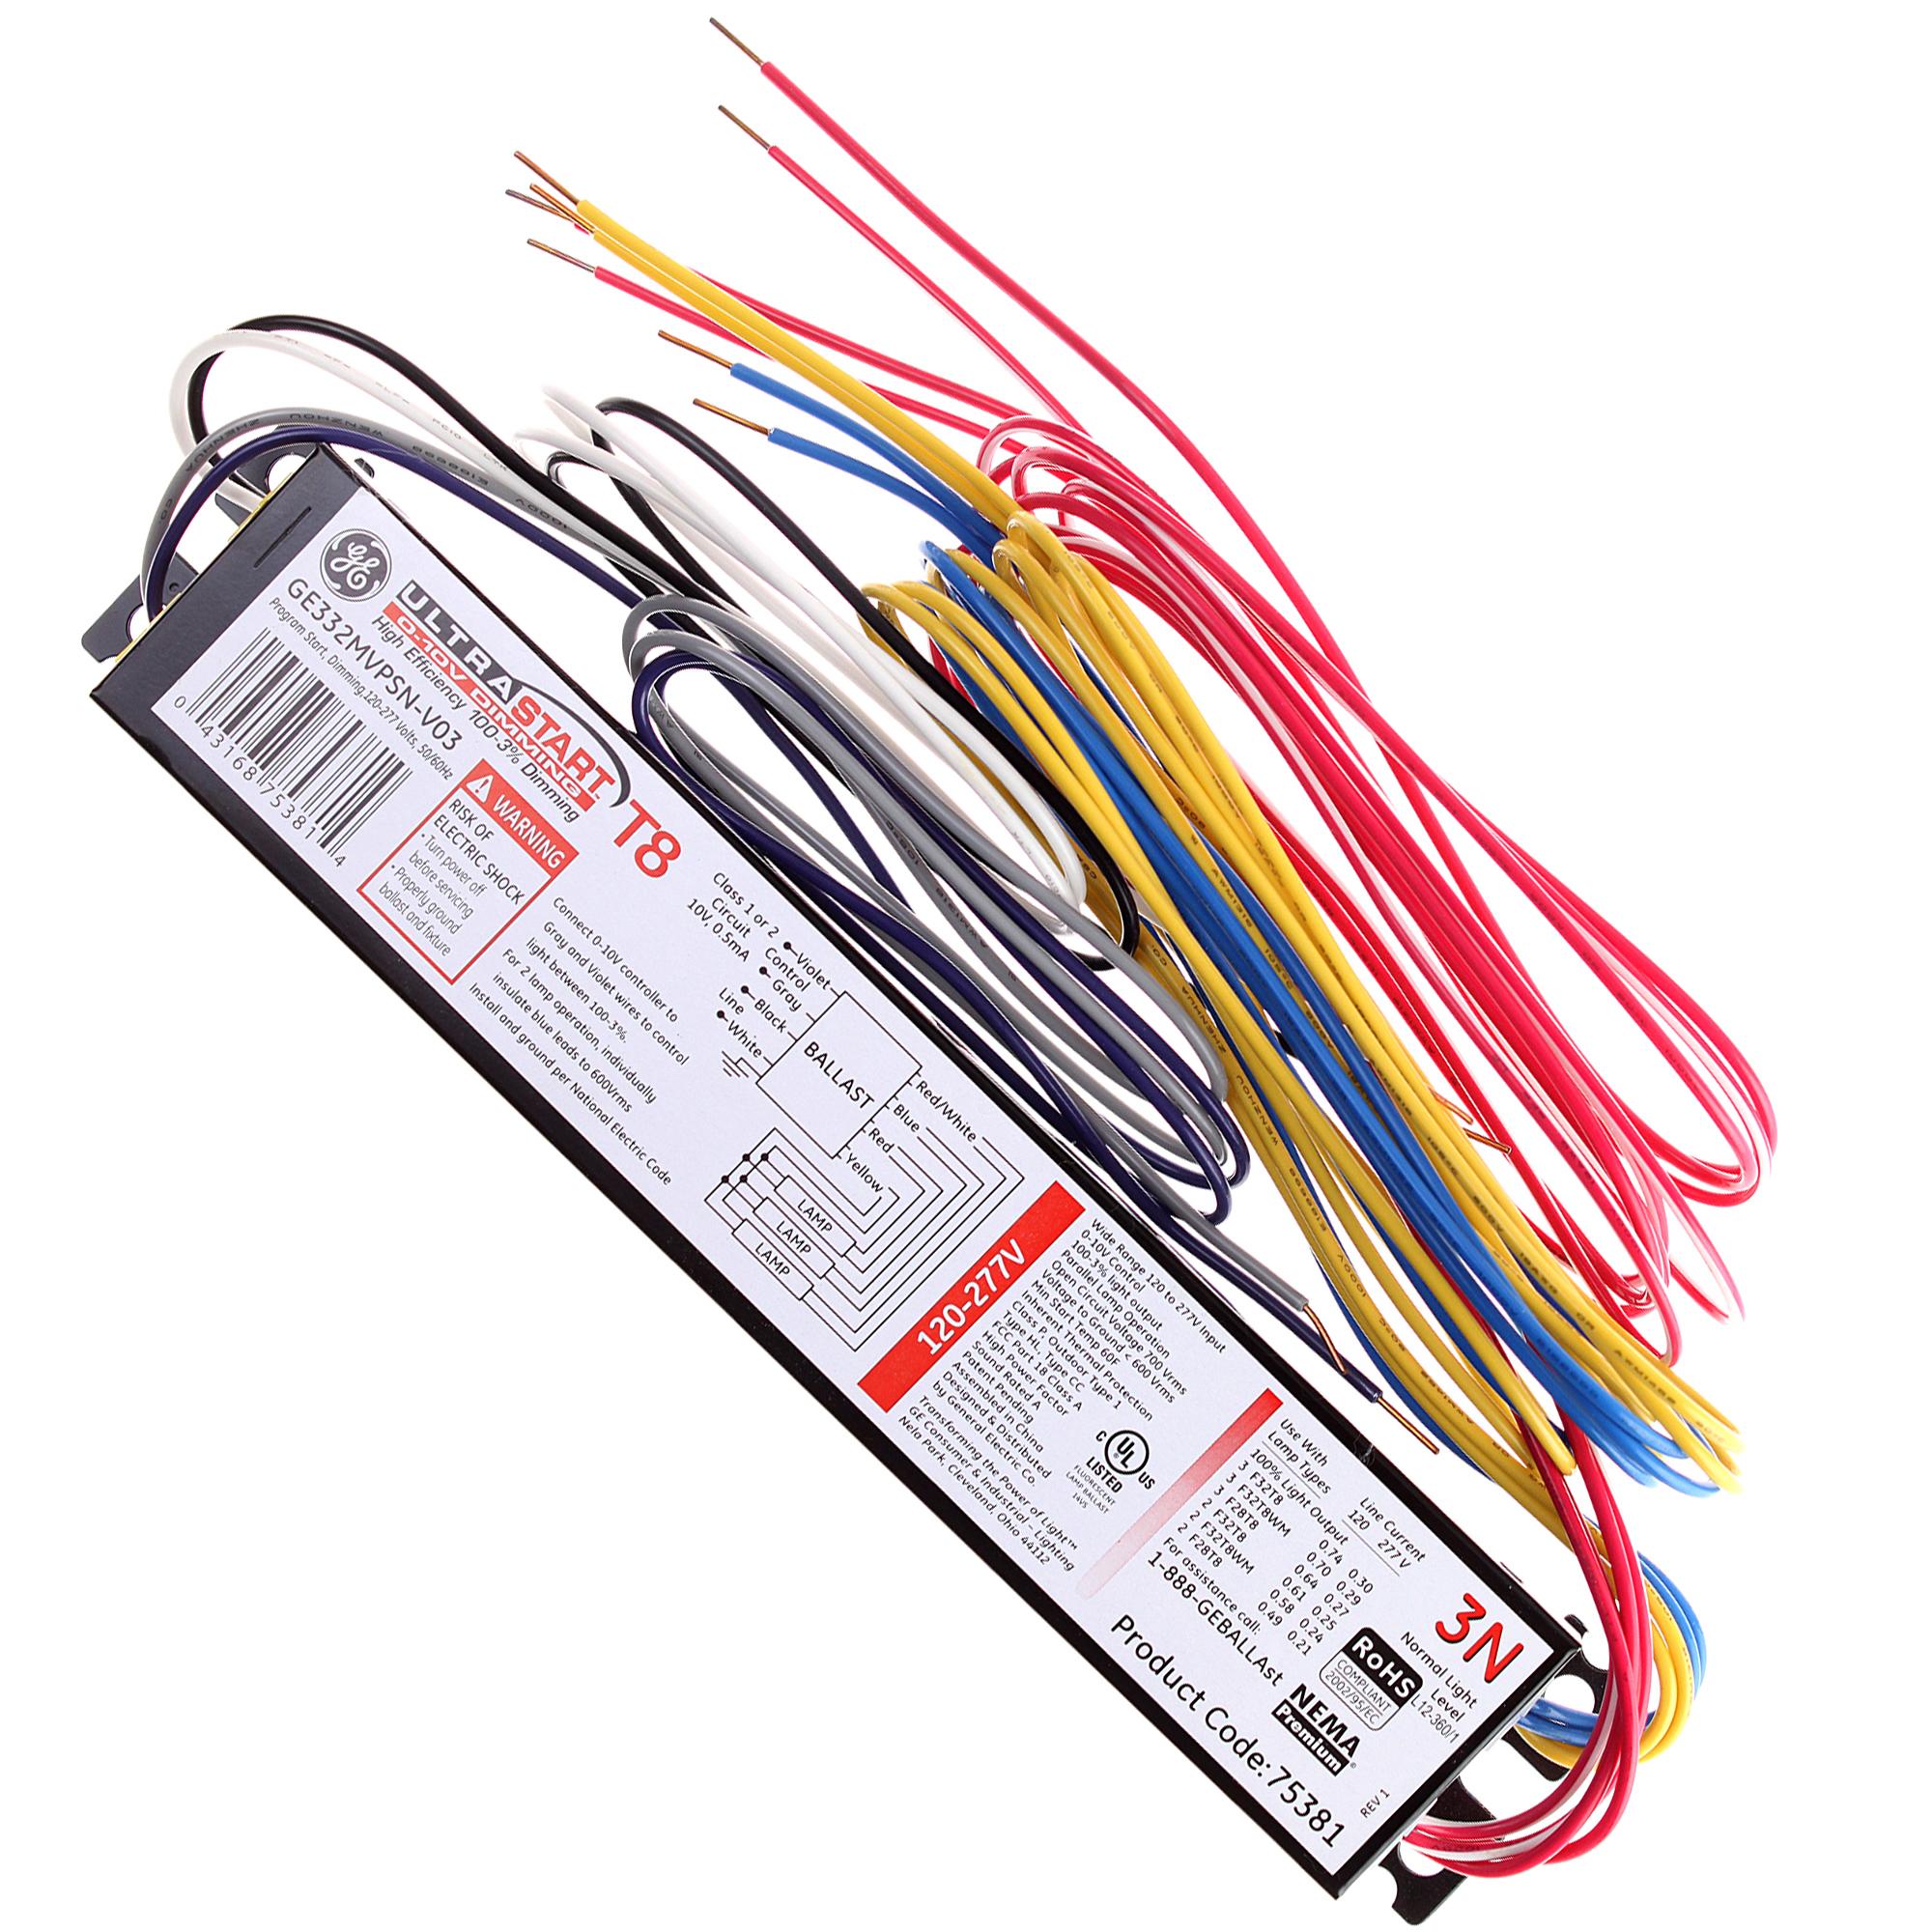 GEGE332MVPS N V03 A?resize\=665%2C665 ge proline t12 ballast wiring diagram wiring diagrams ge-240-rs-mv-n wiring diagram at n-0.co